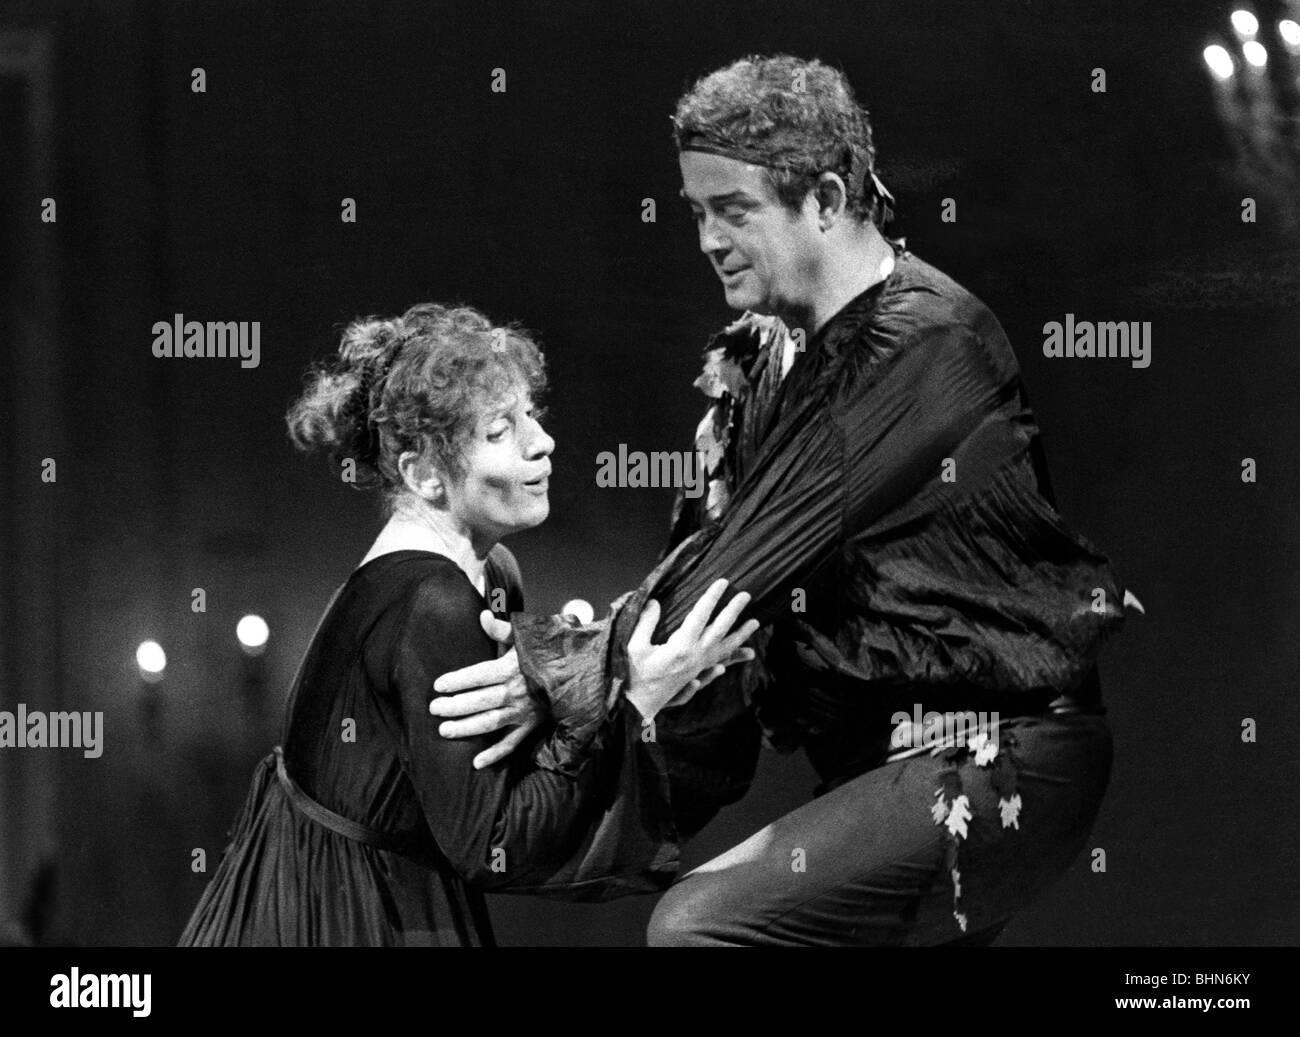 "Behrens, Hildegard, 9.2.1937 - 18.8.2009, German opera singer (soprano), with James King, scene from the opera ""Ariadne Stock Photo"